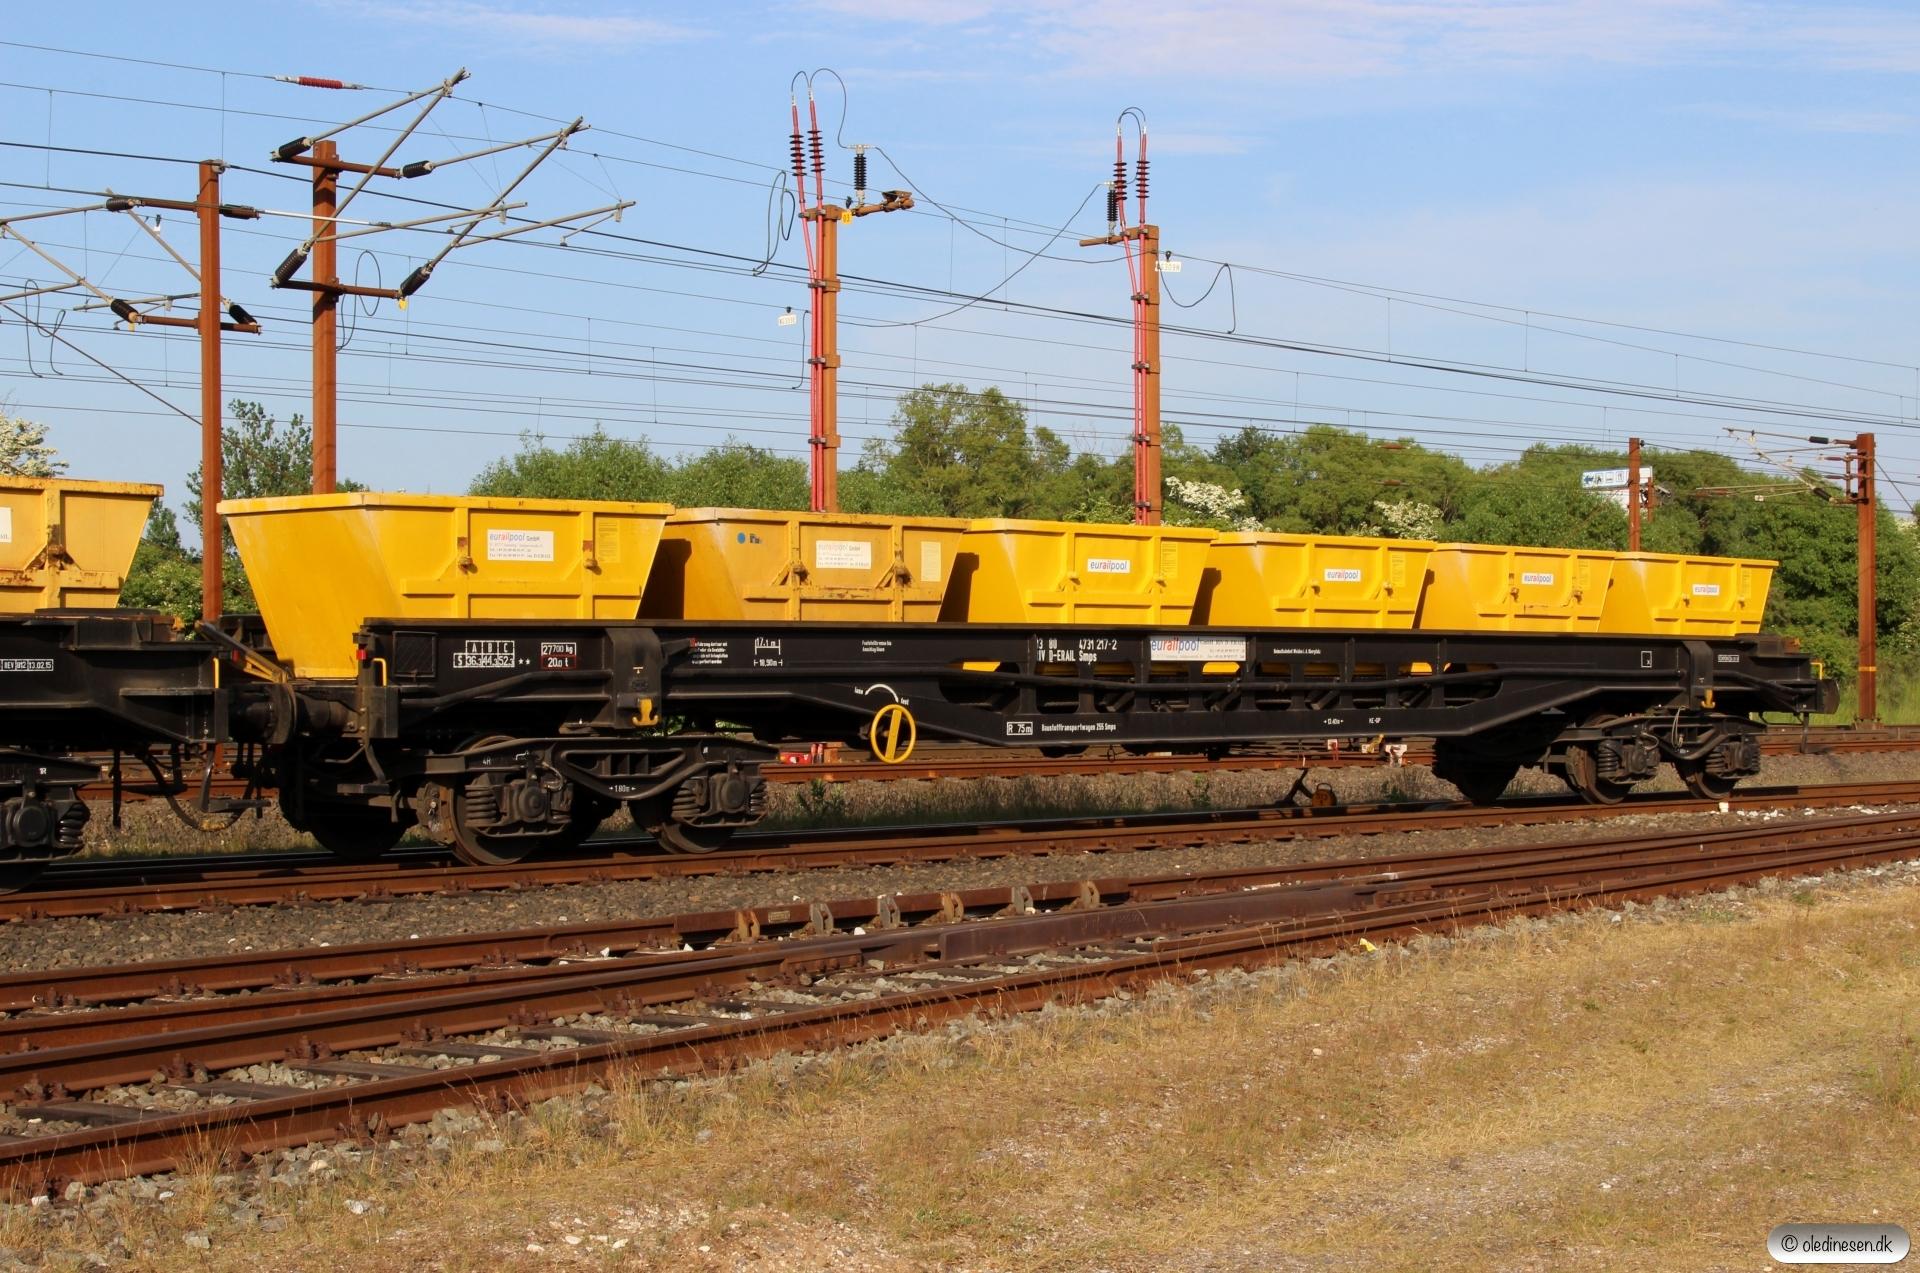 D-ERAIL Smps 33 80 4731 217-2. Nyborg 30.05.2016.